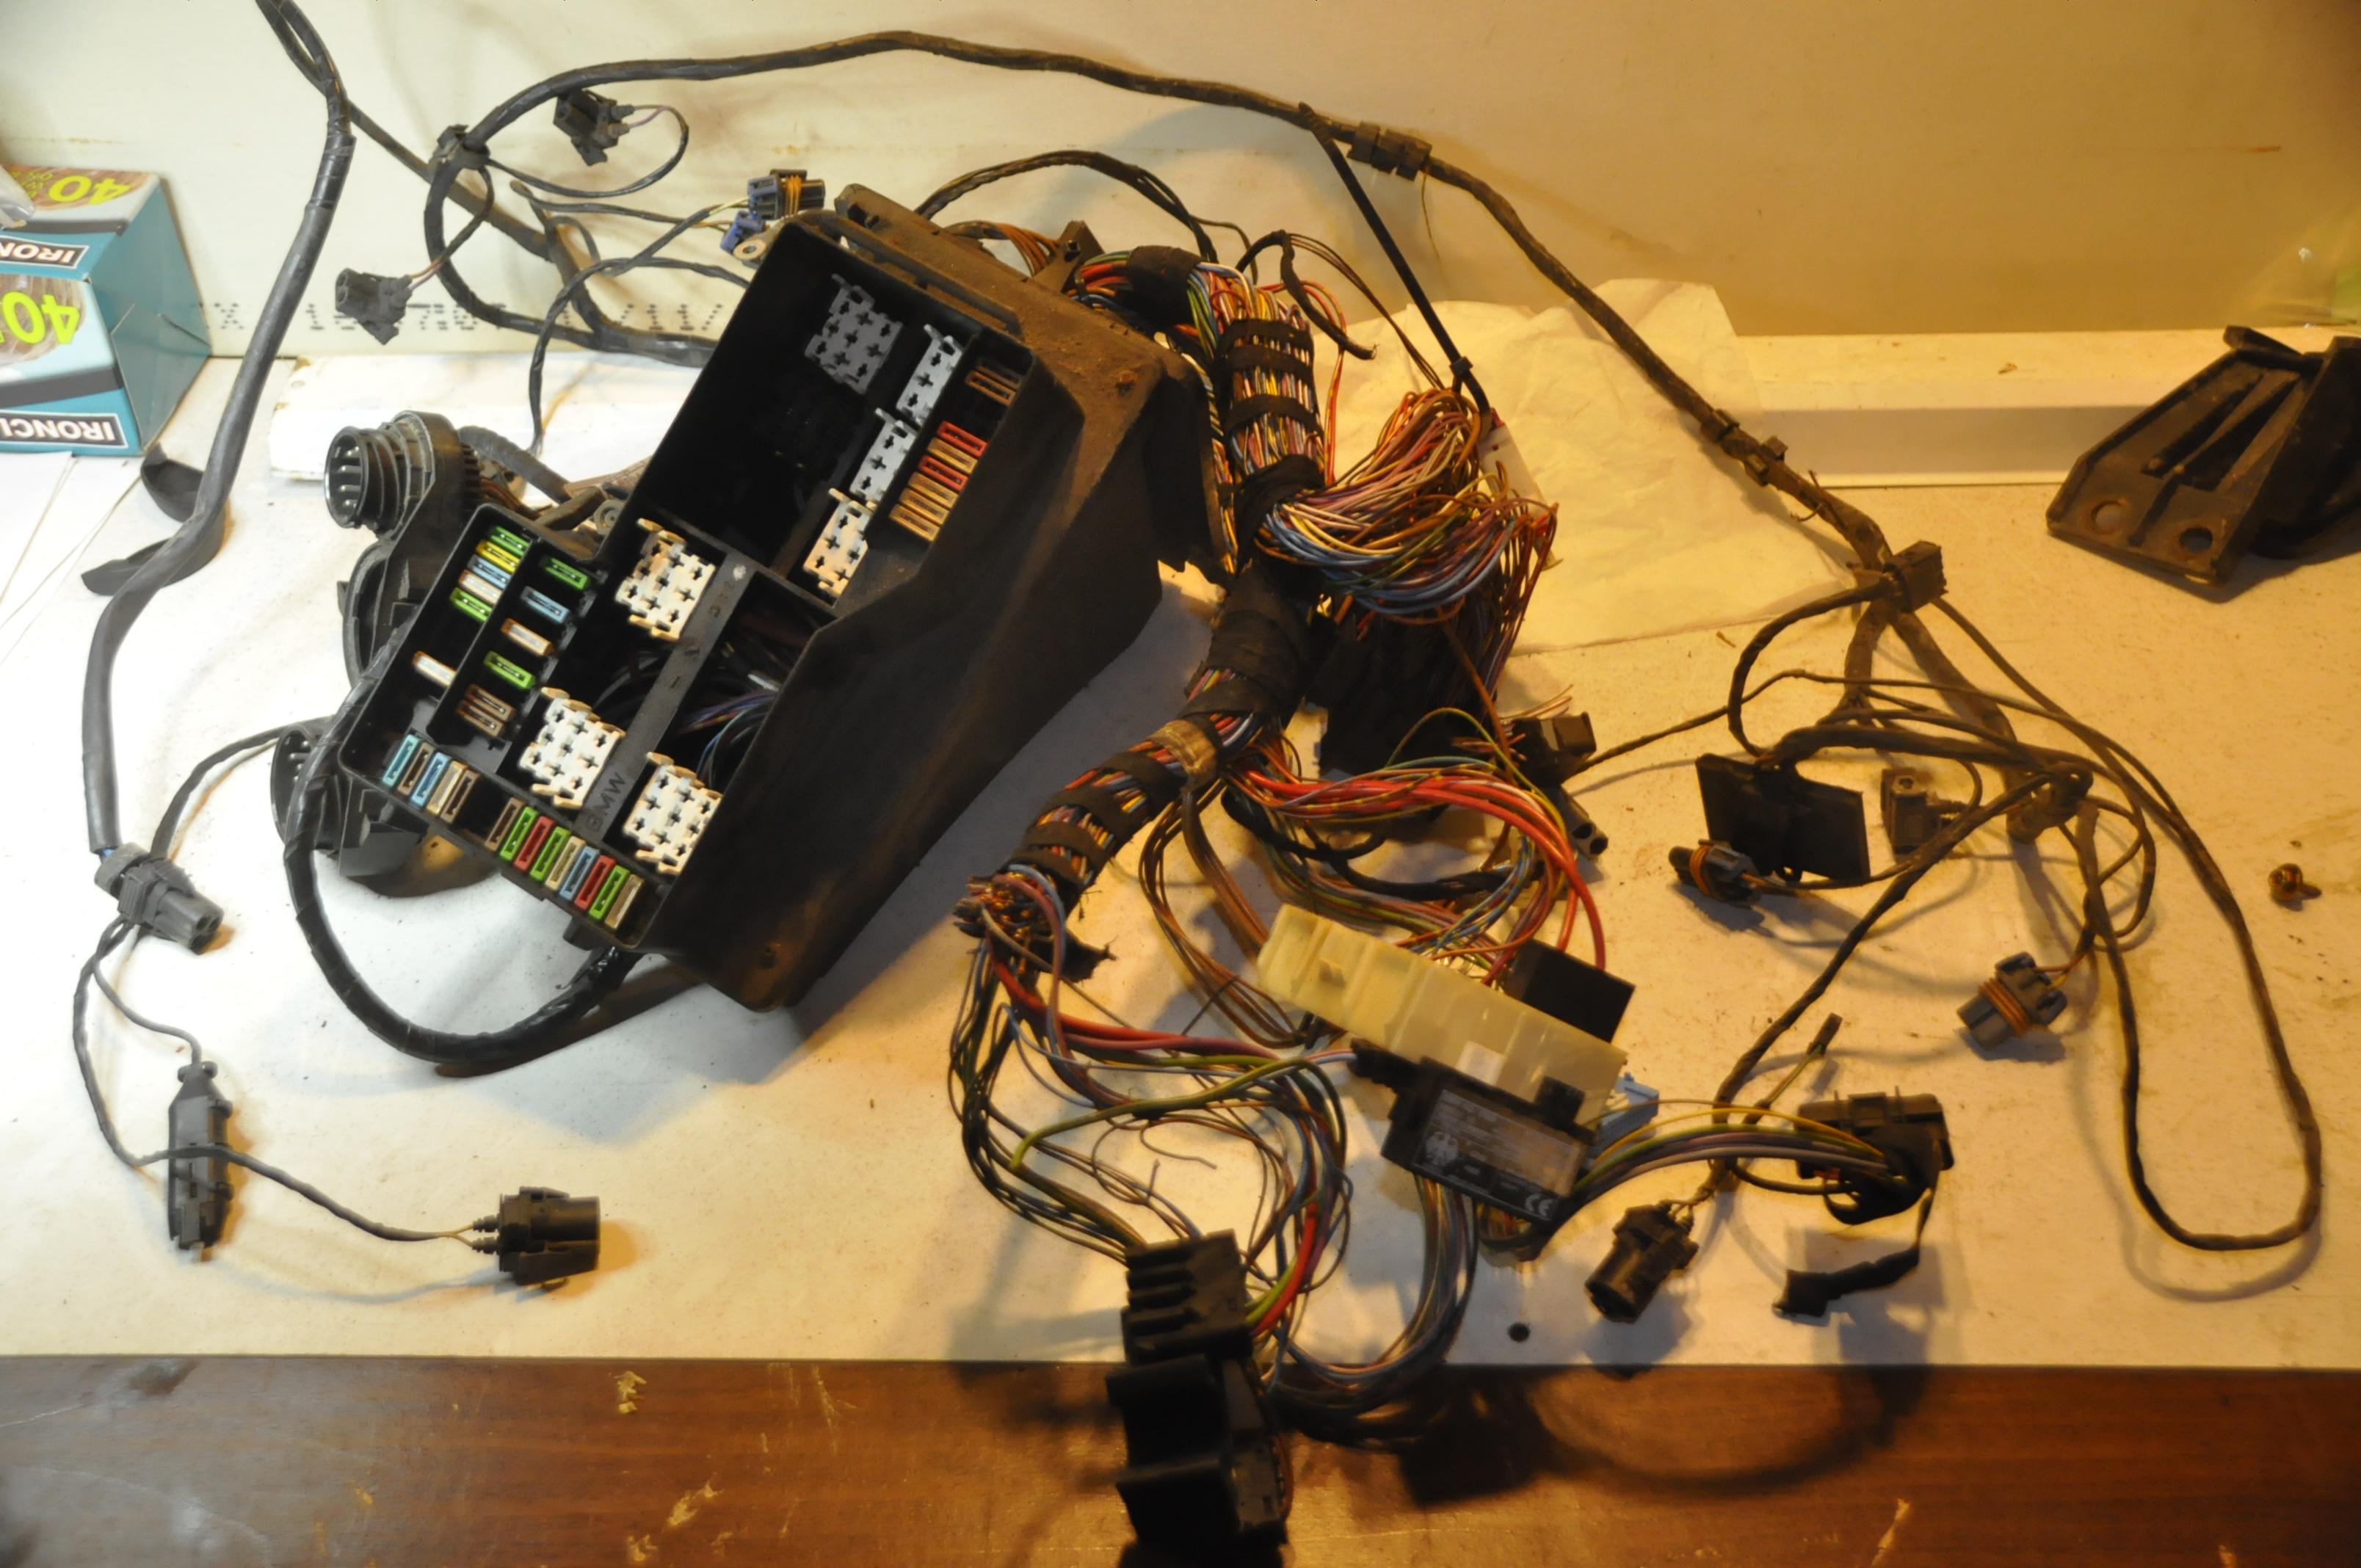 318ti fuse box bmw oem 7152057 used engine compartment wiring harnes with fuse  bmw oem 7152057 used engine compartment